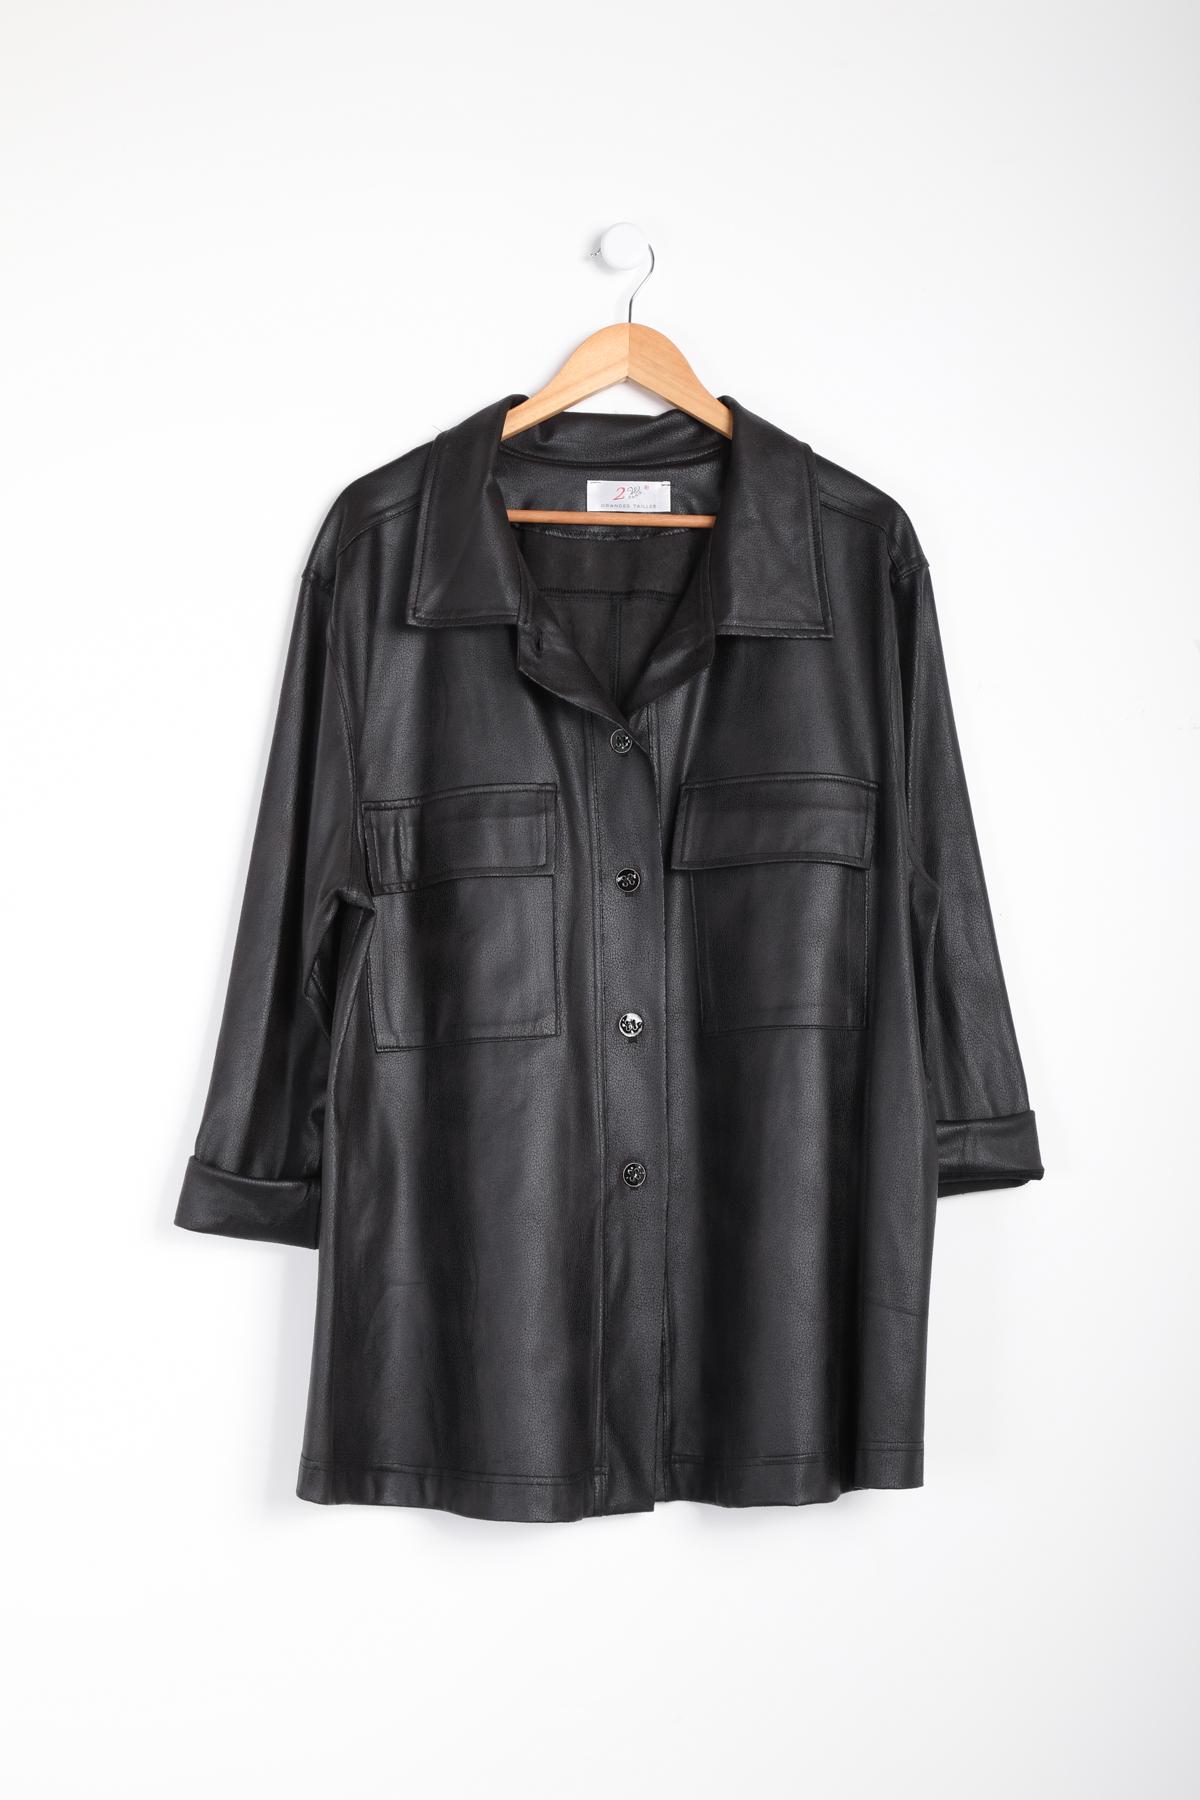 veste grande taille femme 2W PARIS c3409 simili suedine noir 46-60